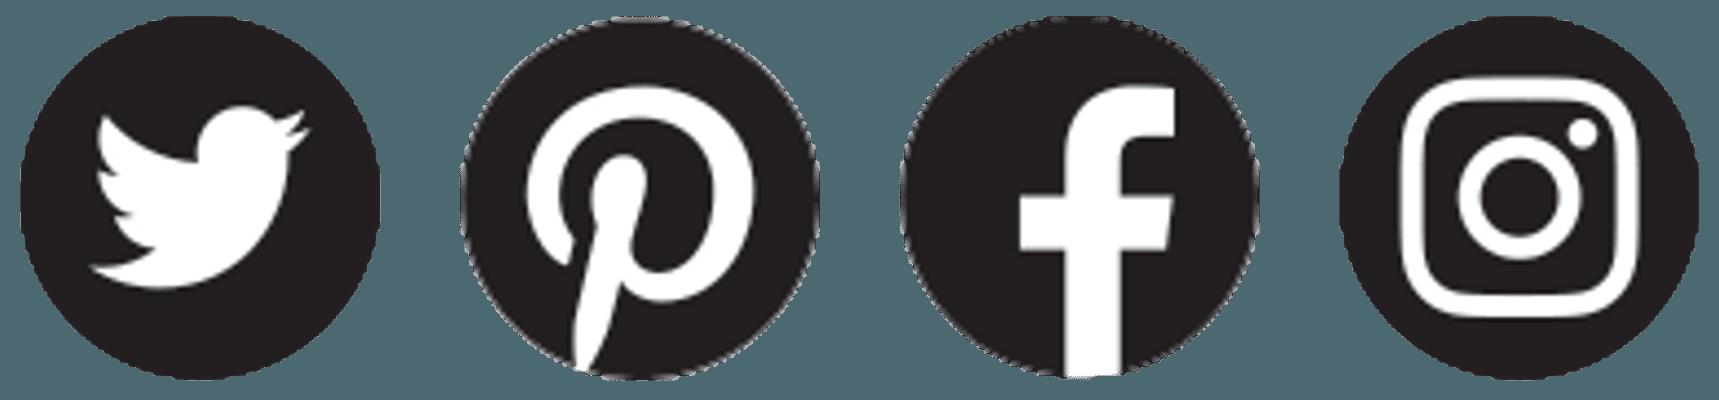 p006-ETG0421-social-logos